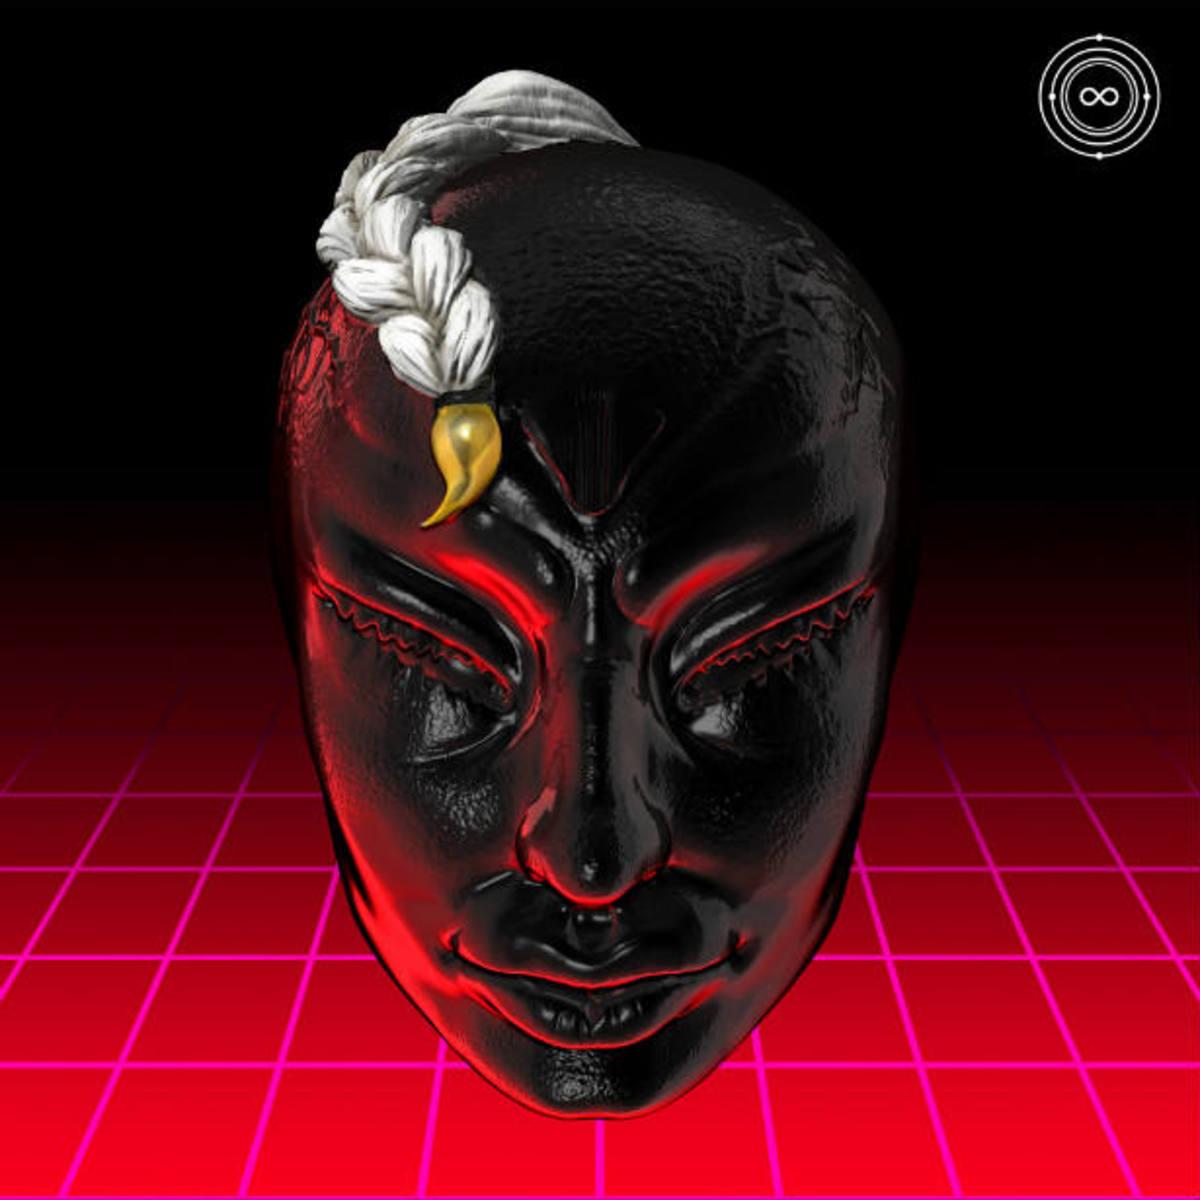 Liar-Scorpio-Infinite-Machine-artwork